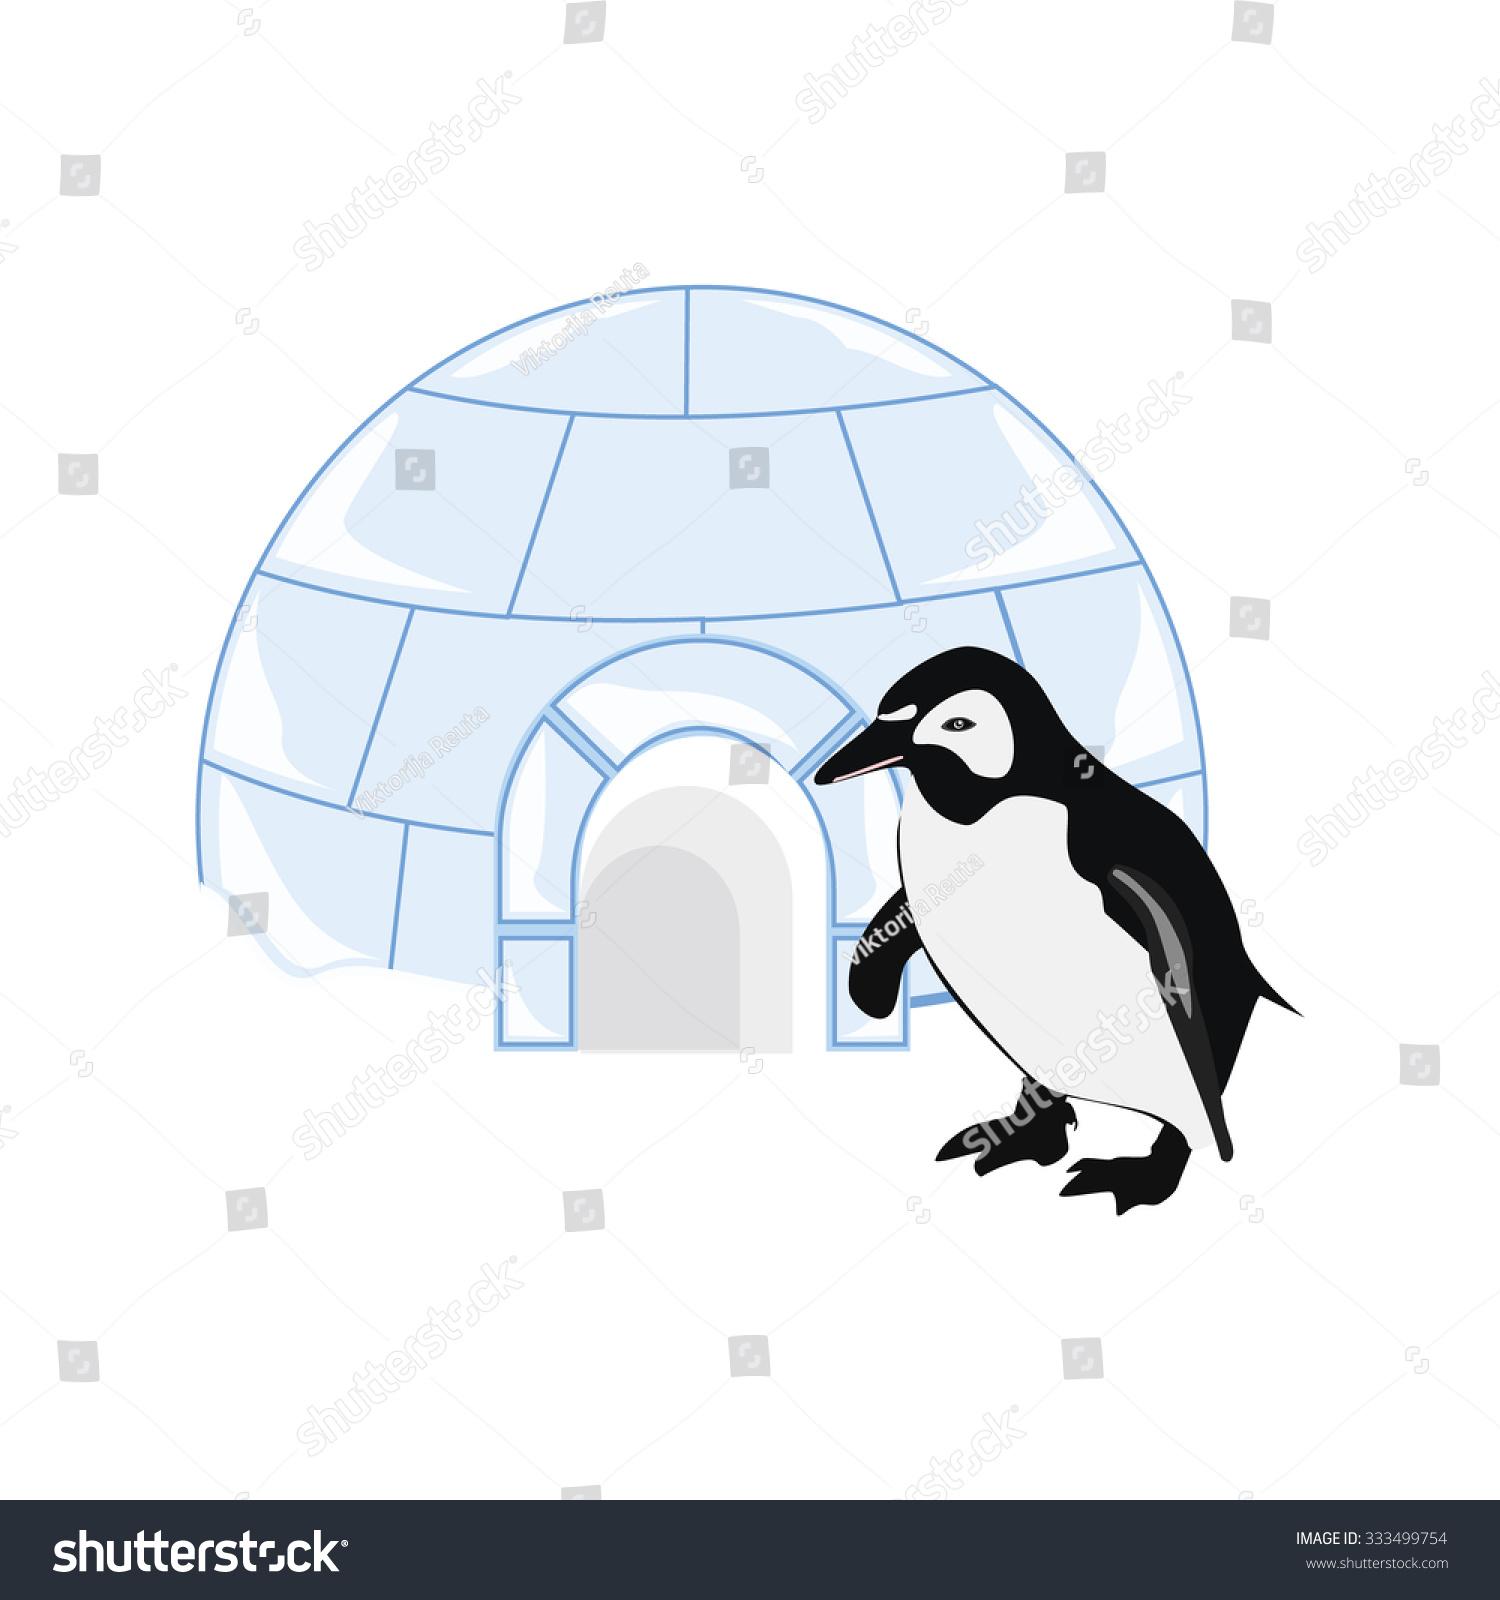 vector illustration snow ice house igloo stock vector 333499754